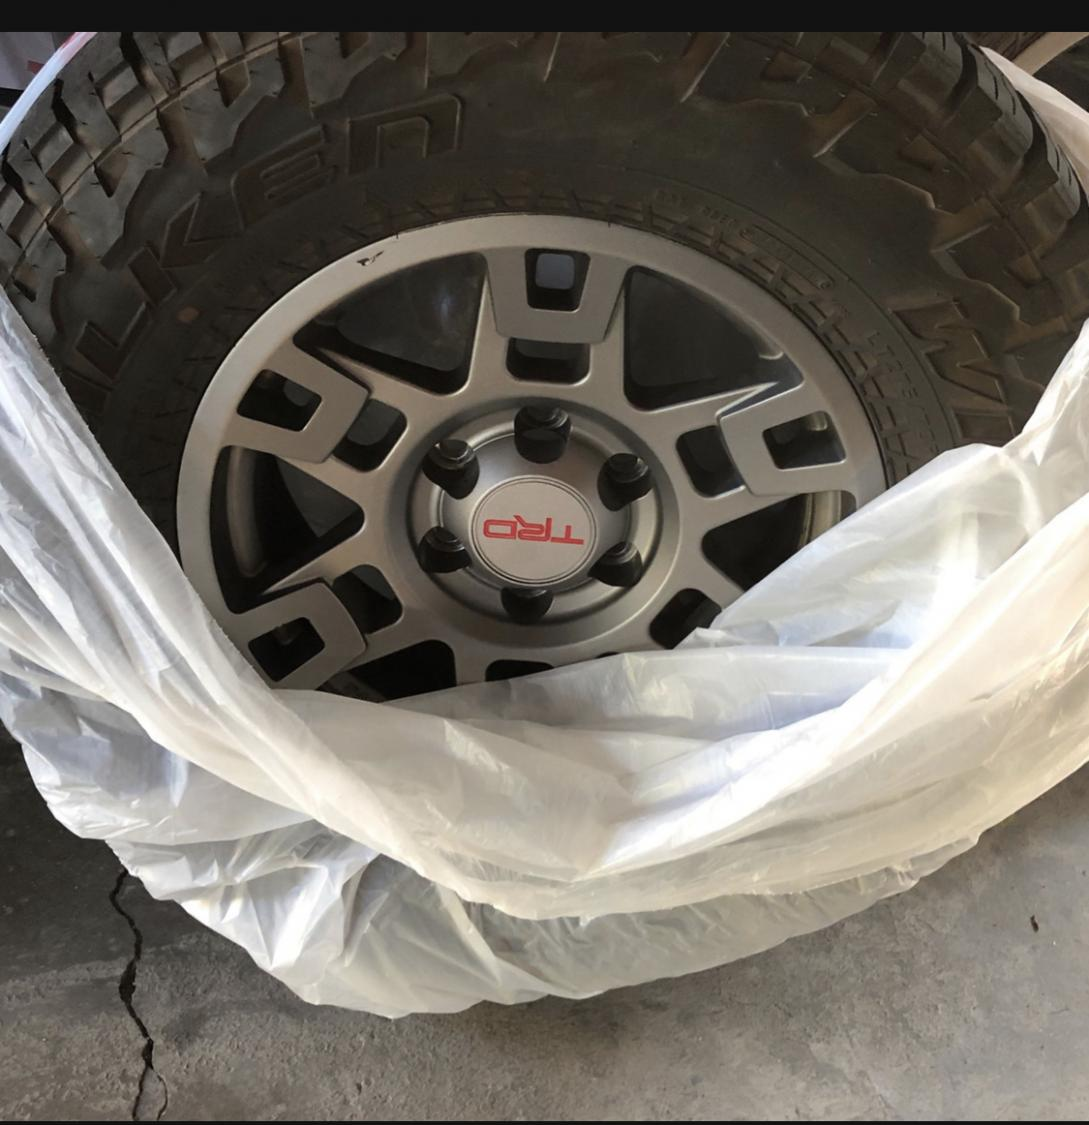 TRD pro Wheels/ Falken Wildpeak AT3275/70/17/ Spider traxx wheel spacers.  SOLD-987d8cec-d509-45e9-9ecc-fe9e8a39db03-jpg